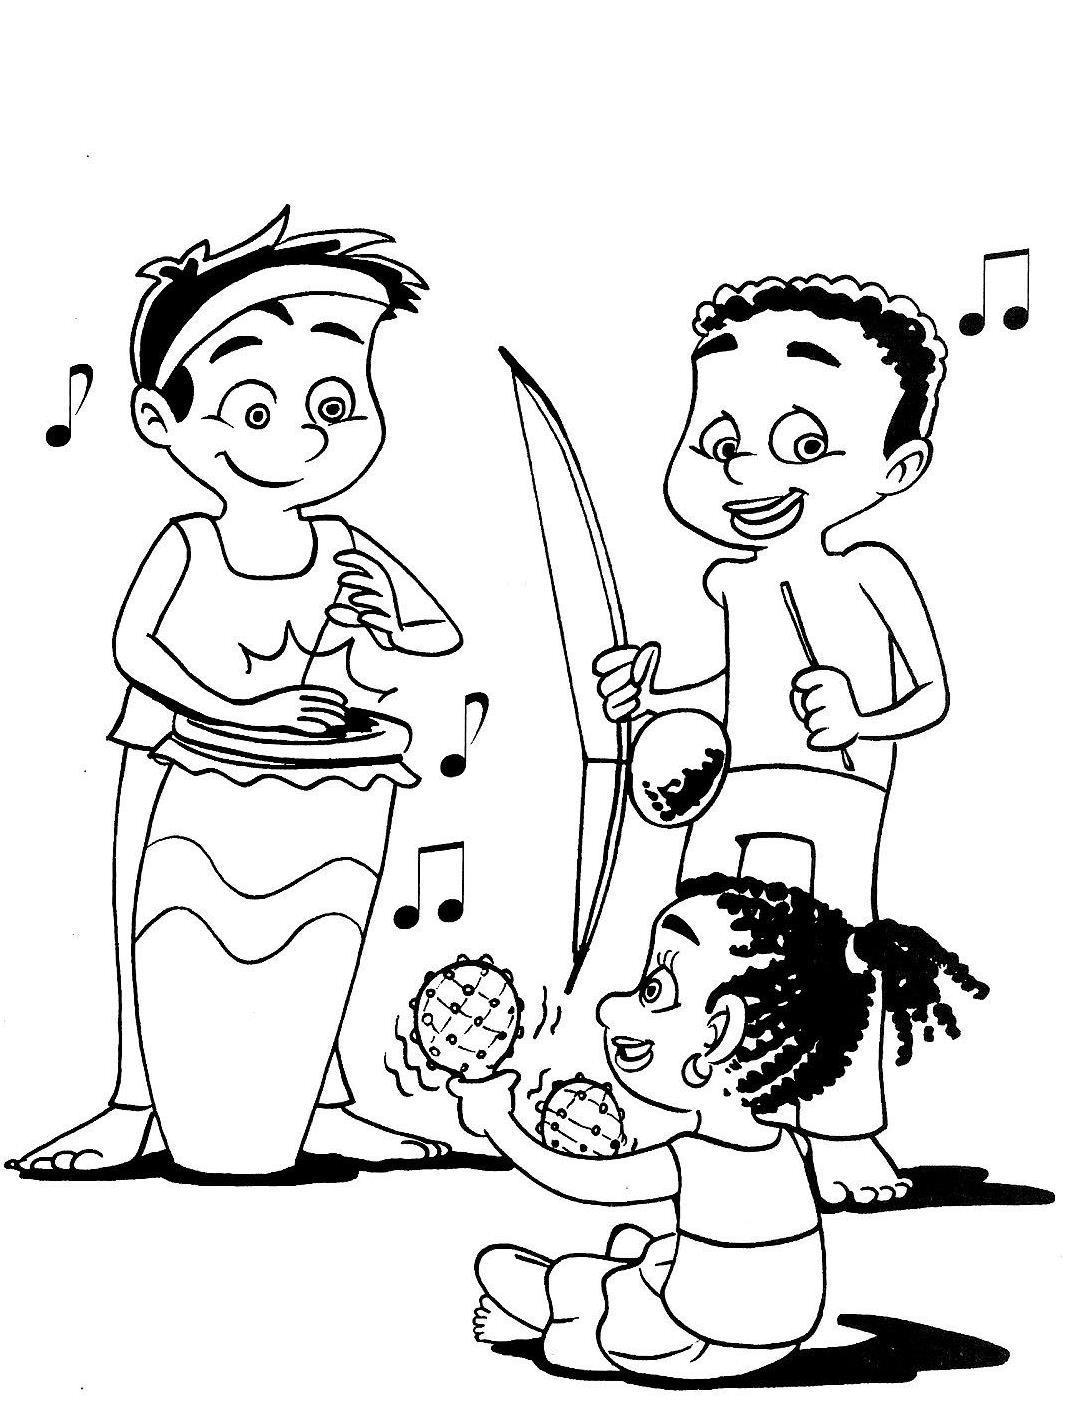 Unidade Escolar Walter de Carvalho Baptista/Educando Para